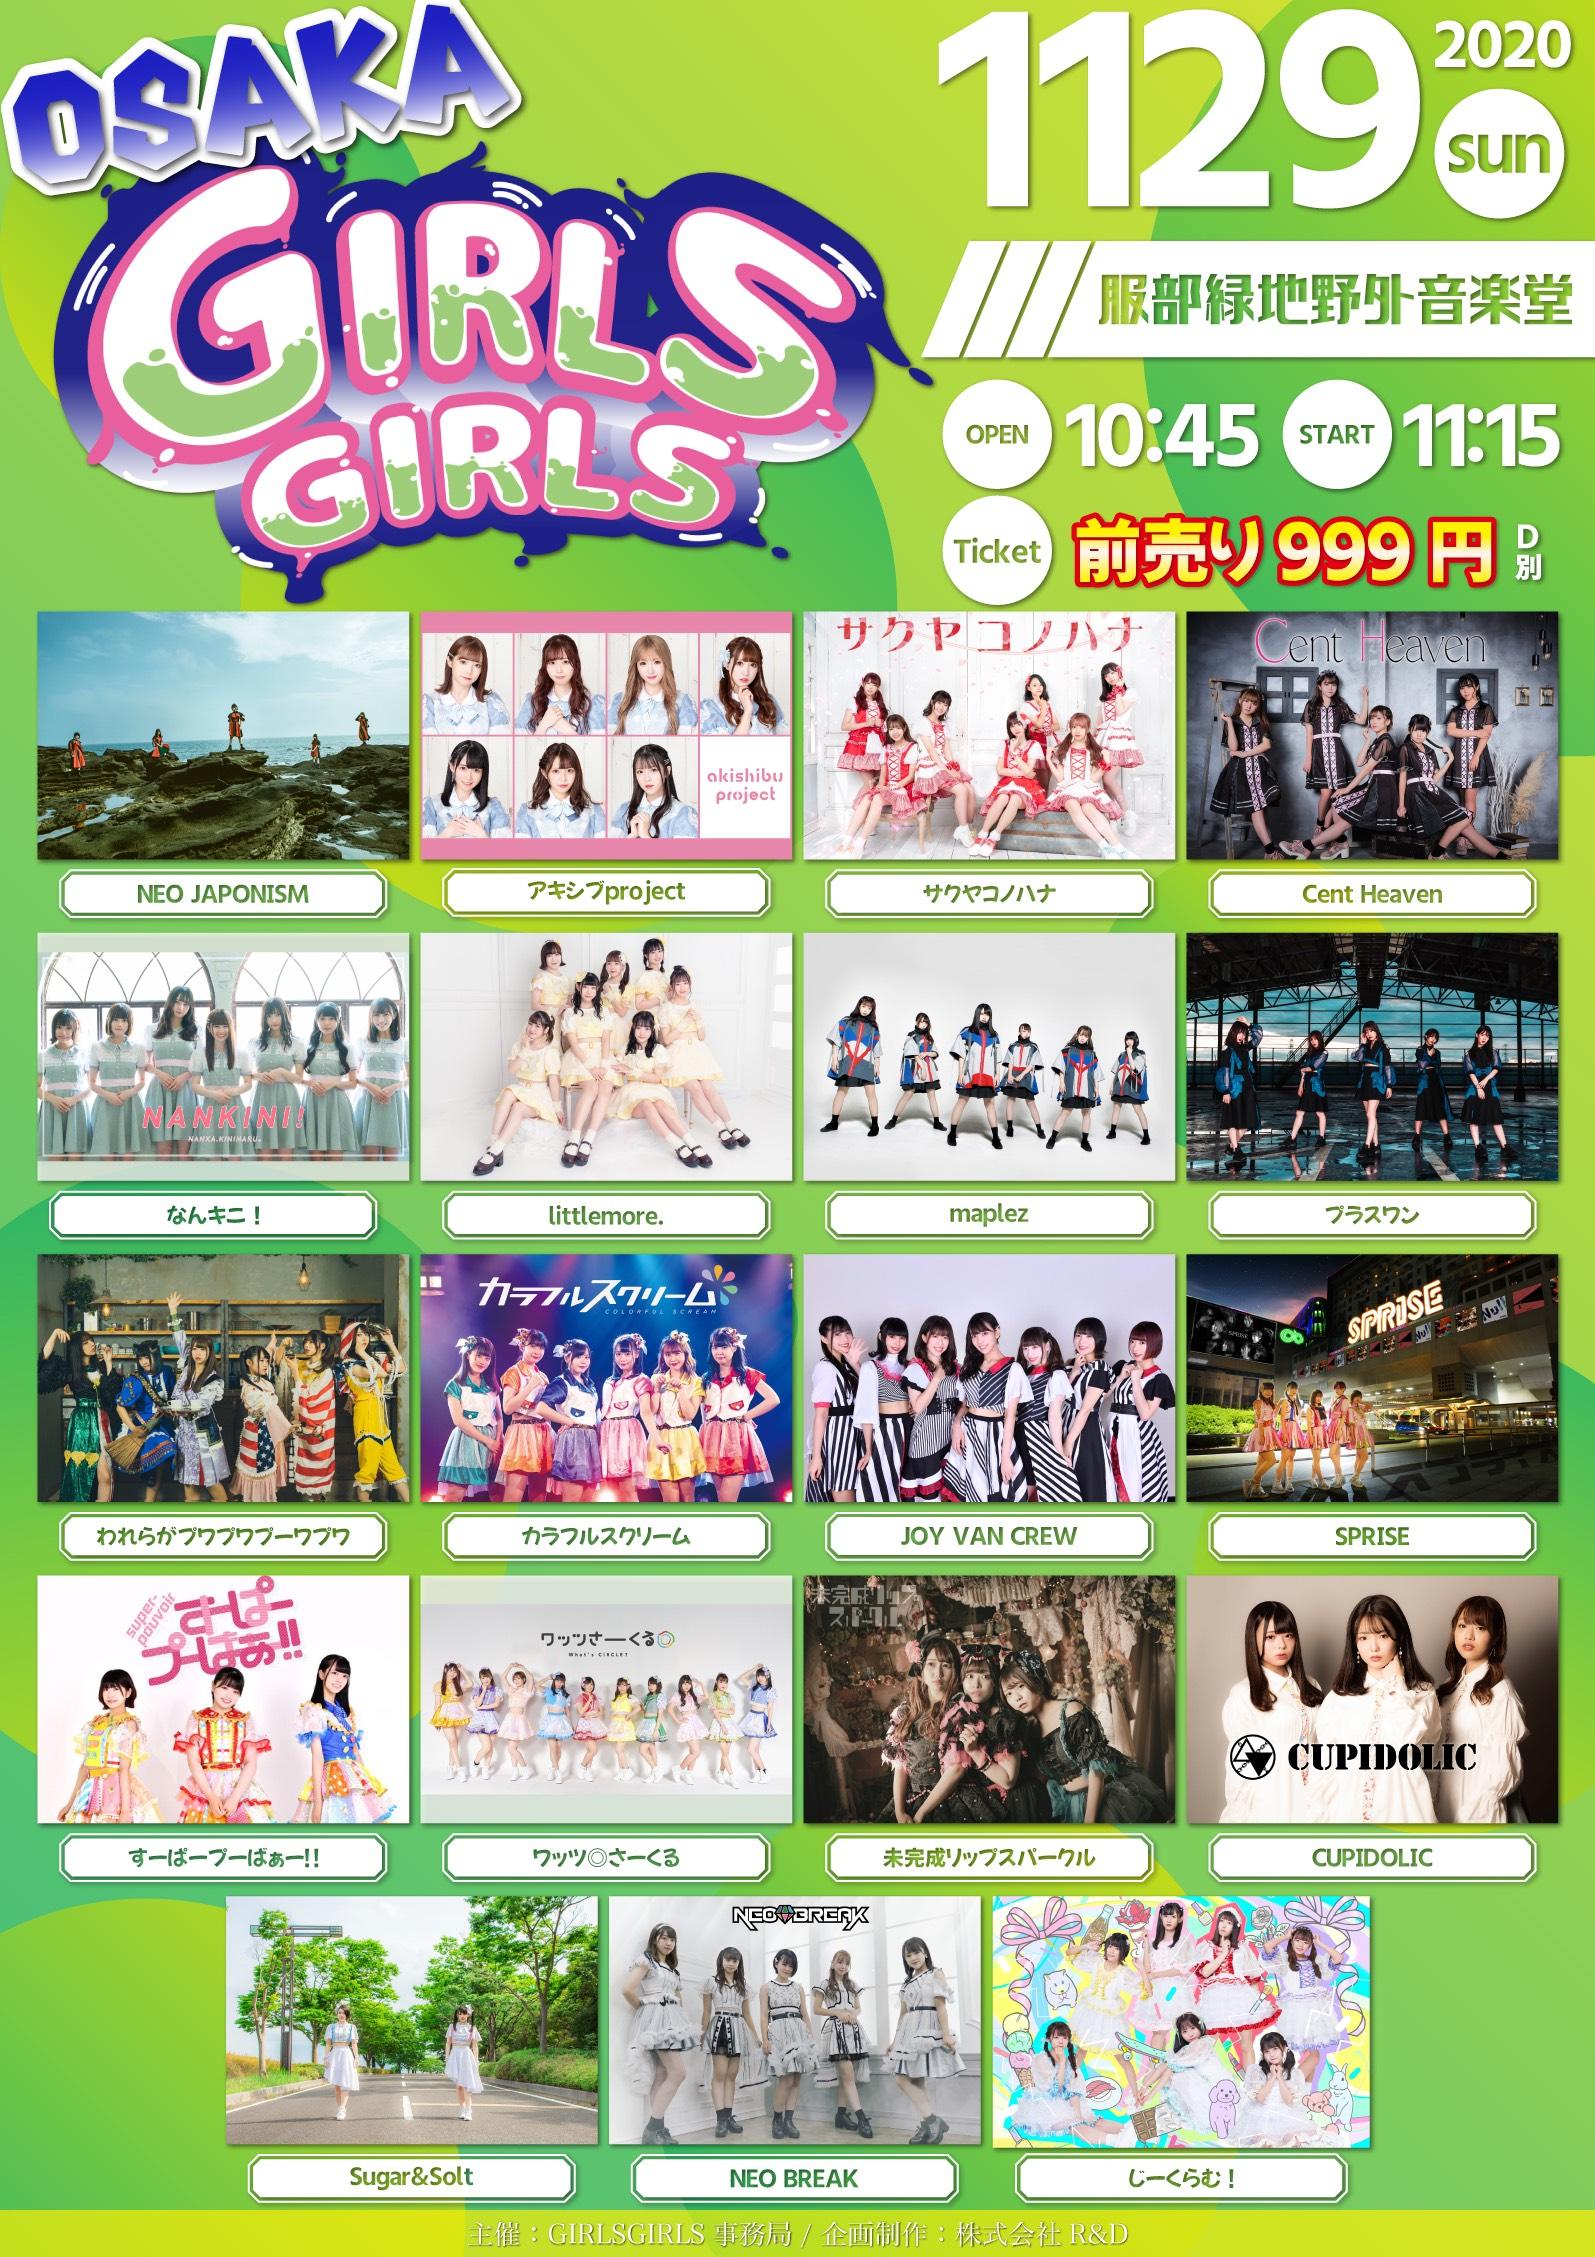 11/29(日)  OSAKA GIRLS GIRLS in 服部緑地野外音楽堂